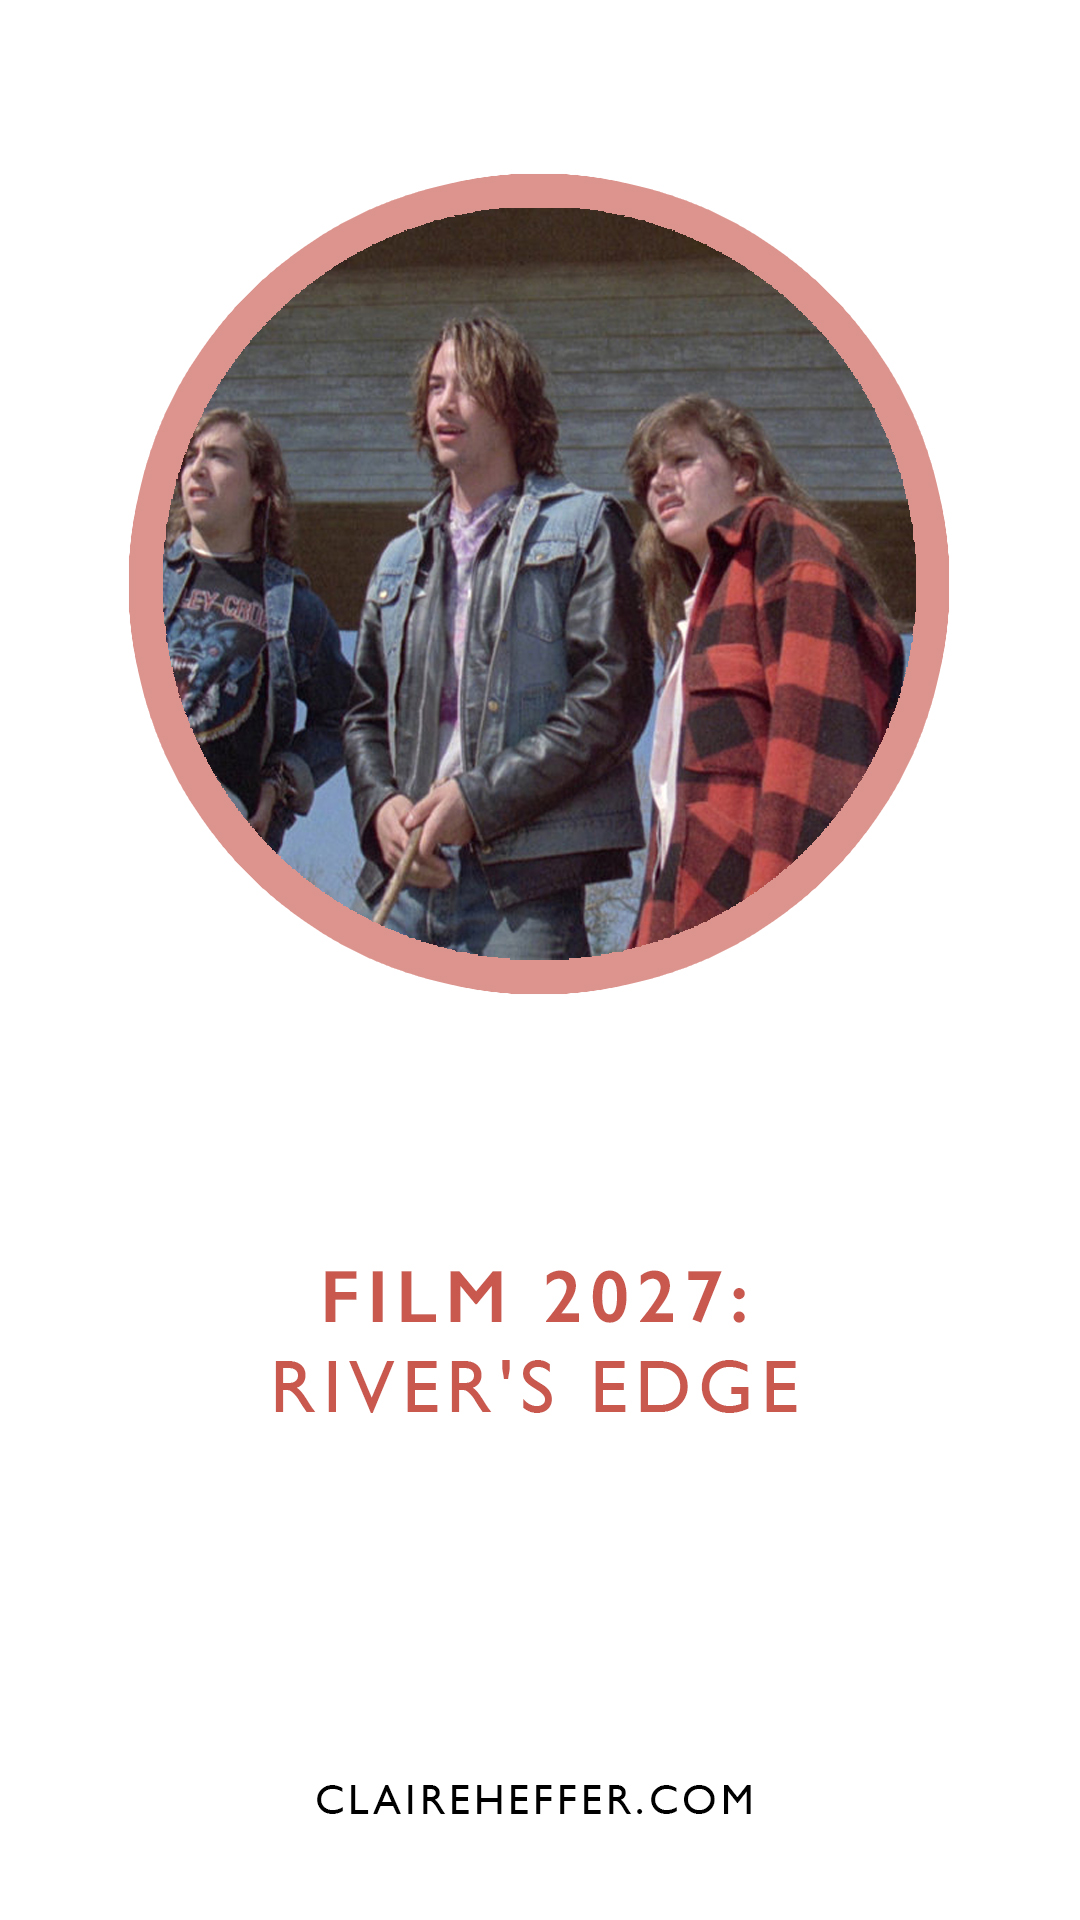 RIVERS EDGE 1986 FILM LIST KEANU REEVES IONE SKYE CRISPIN GLOVER FILM TRIVIA.jpg